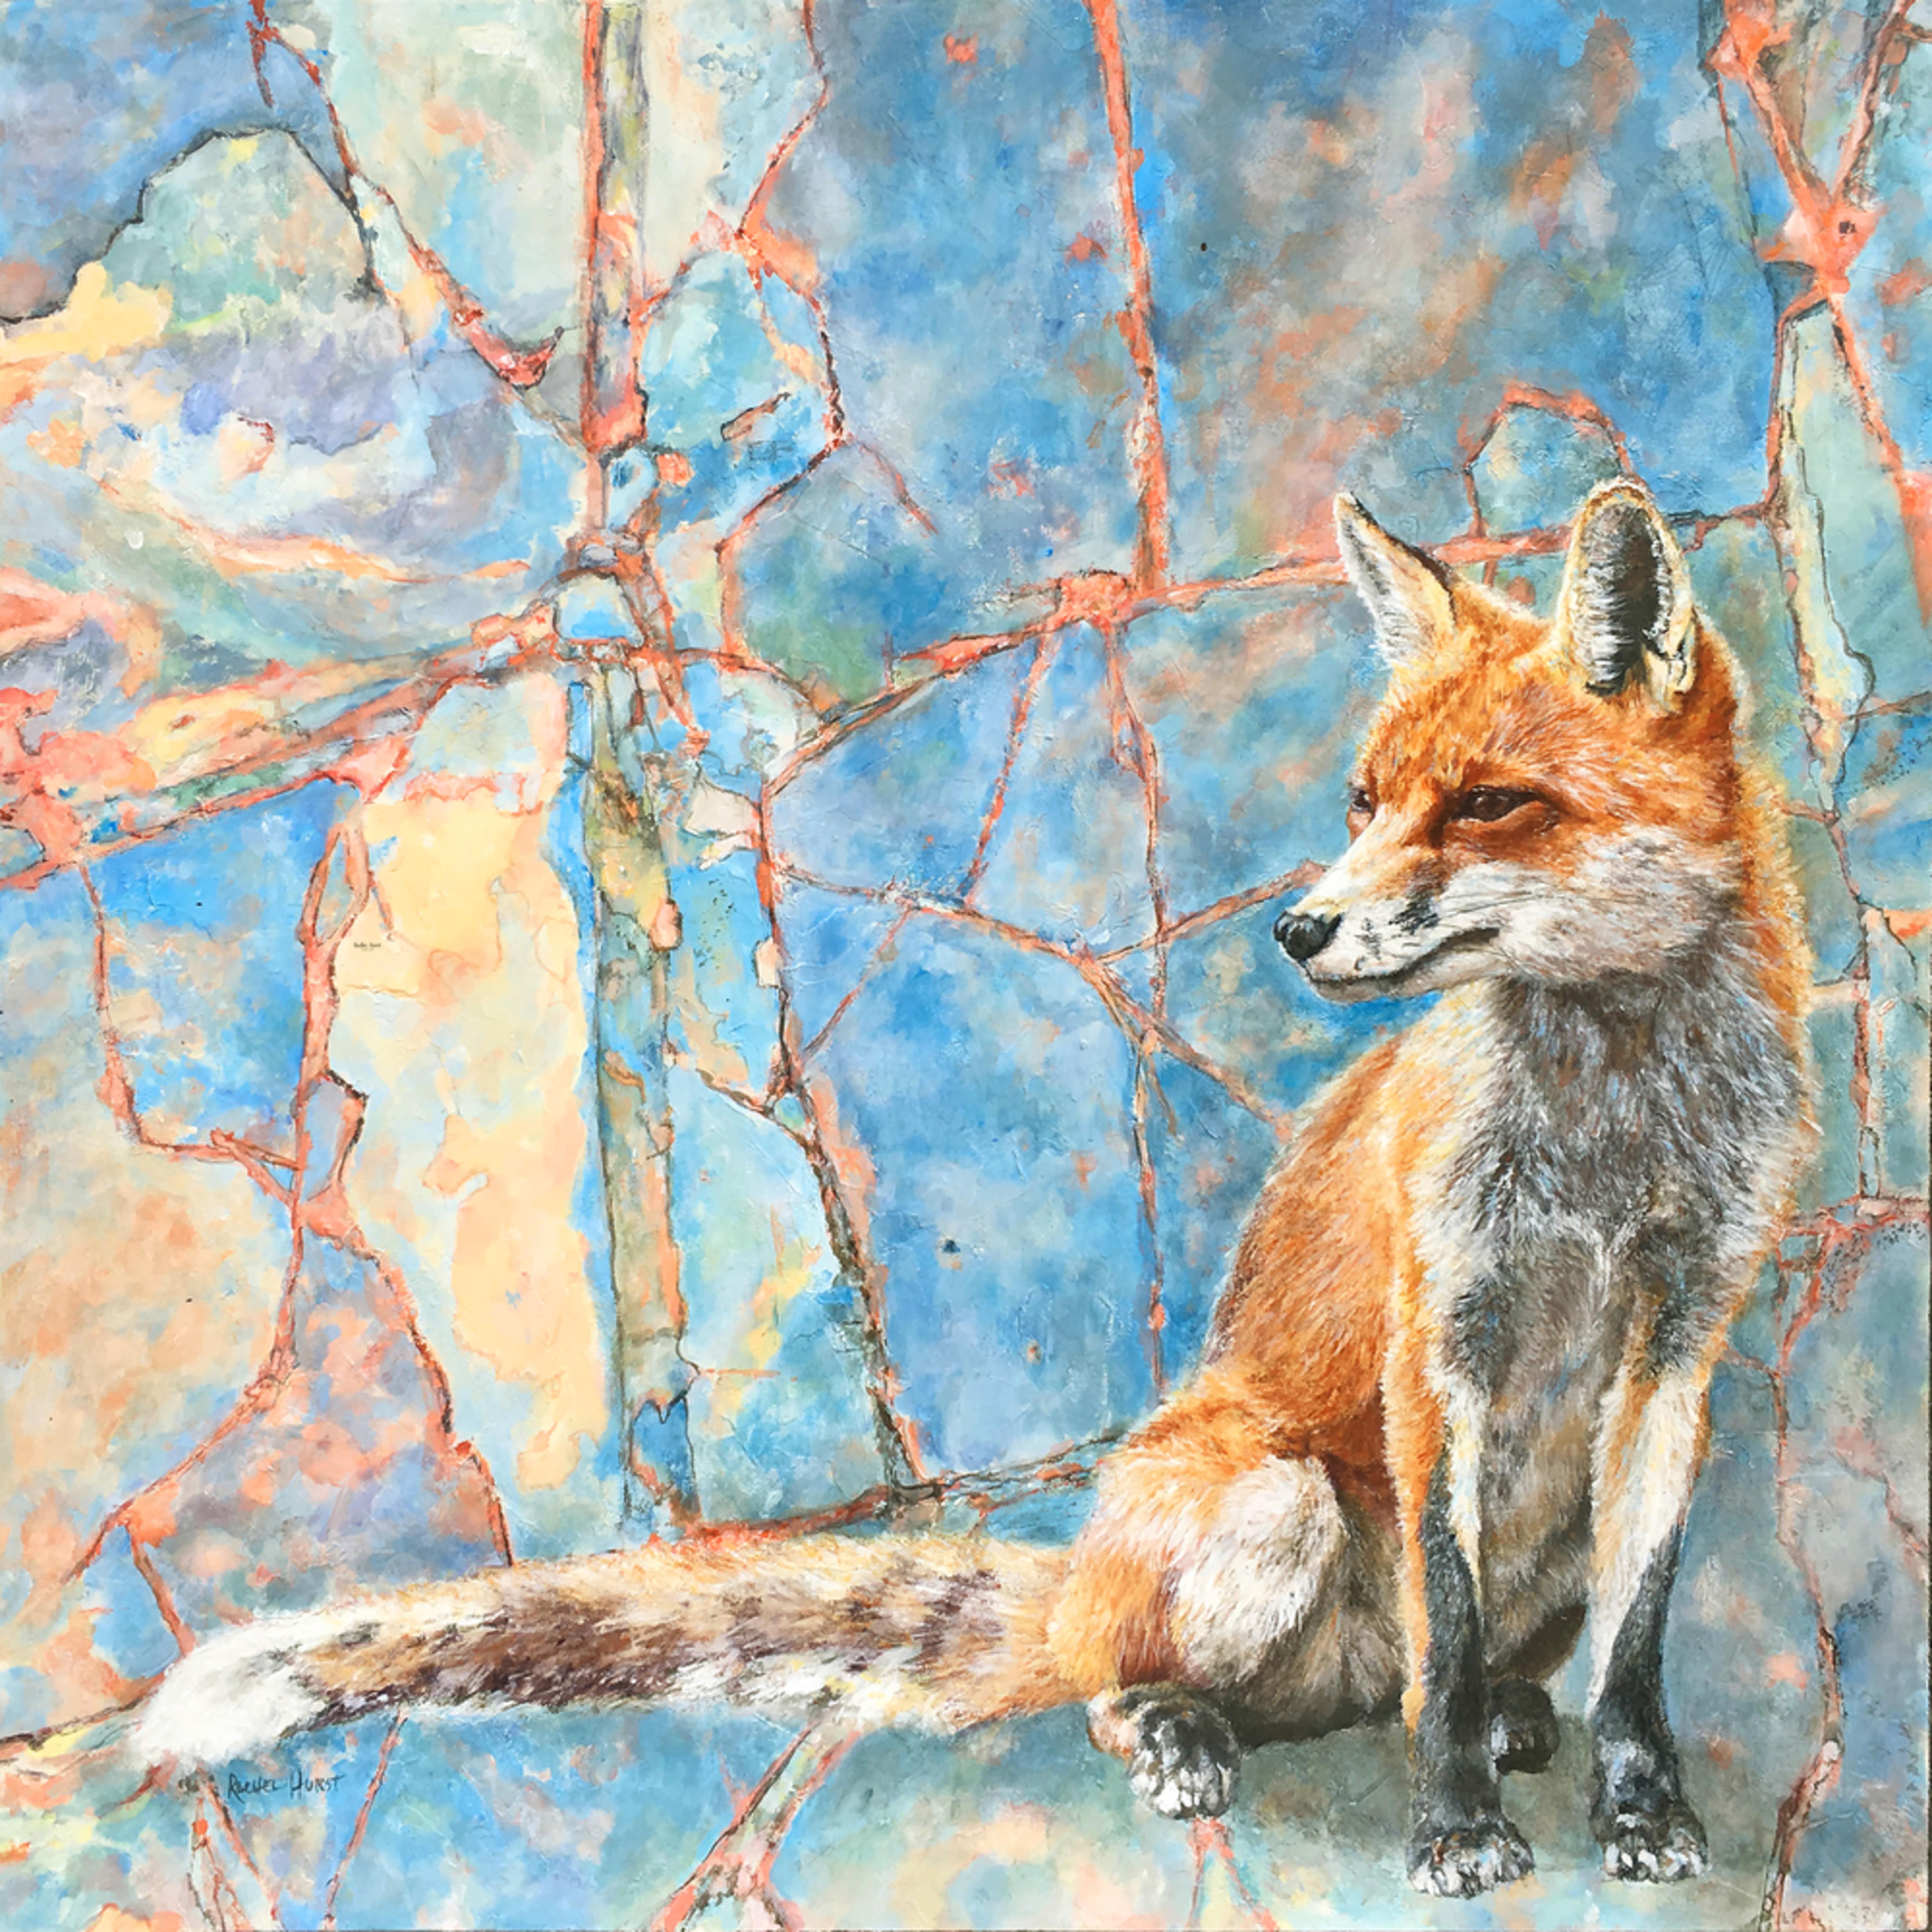 Neon fox jazmrp